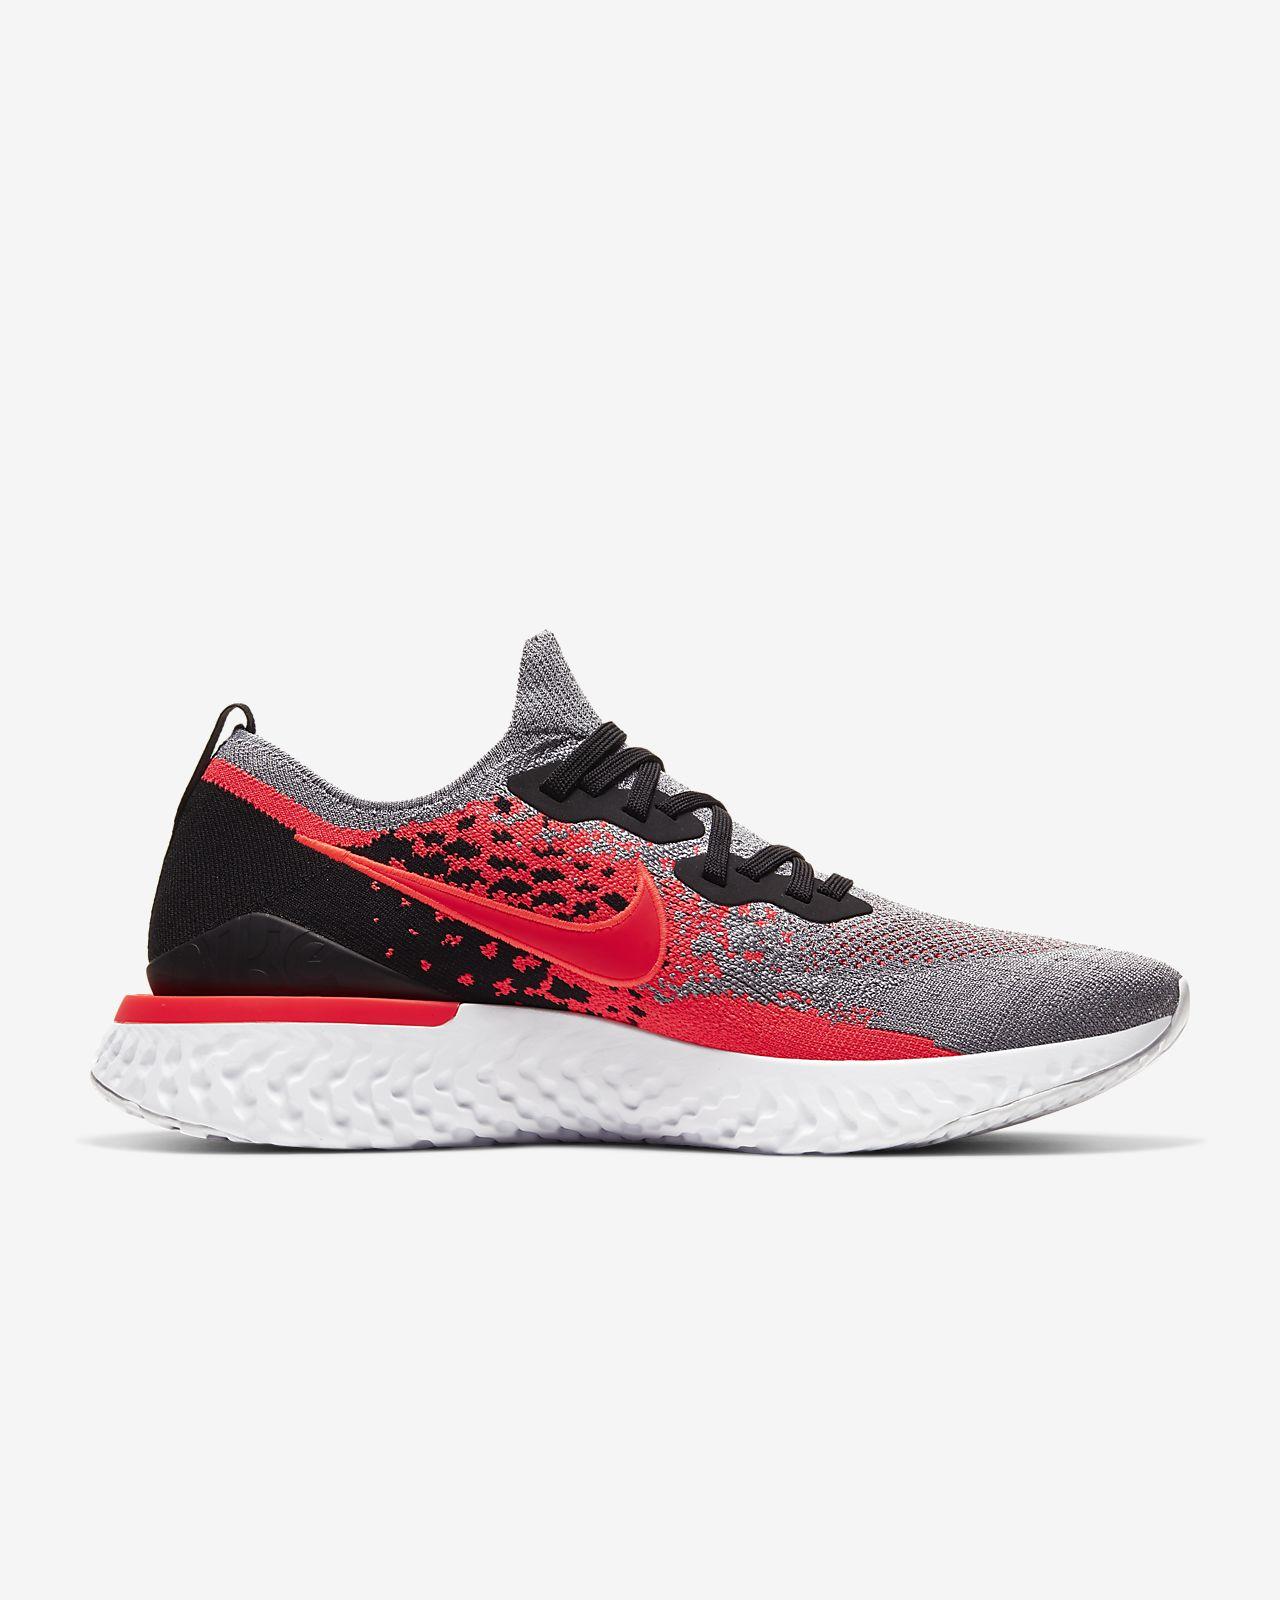 Leistung Neueste Trends Stil Adidas Ultra Boost Laufschuhe